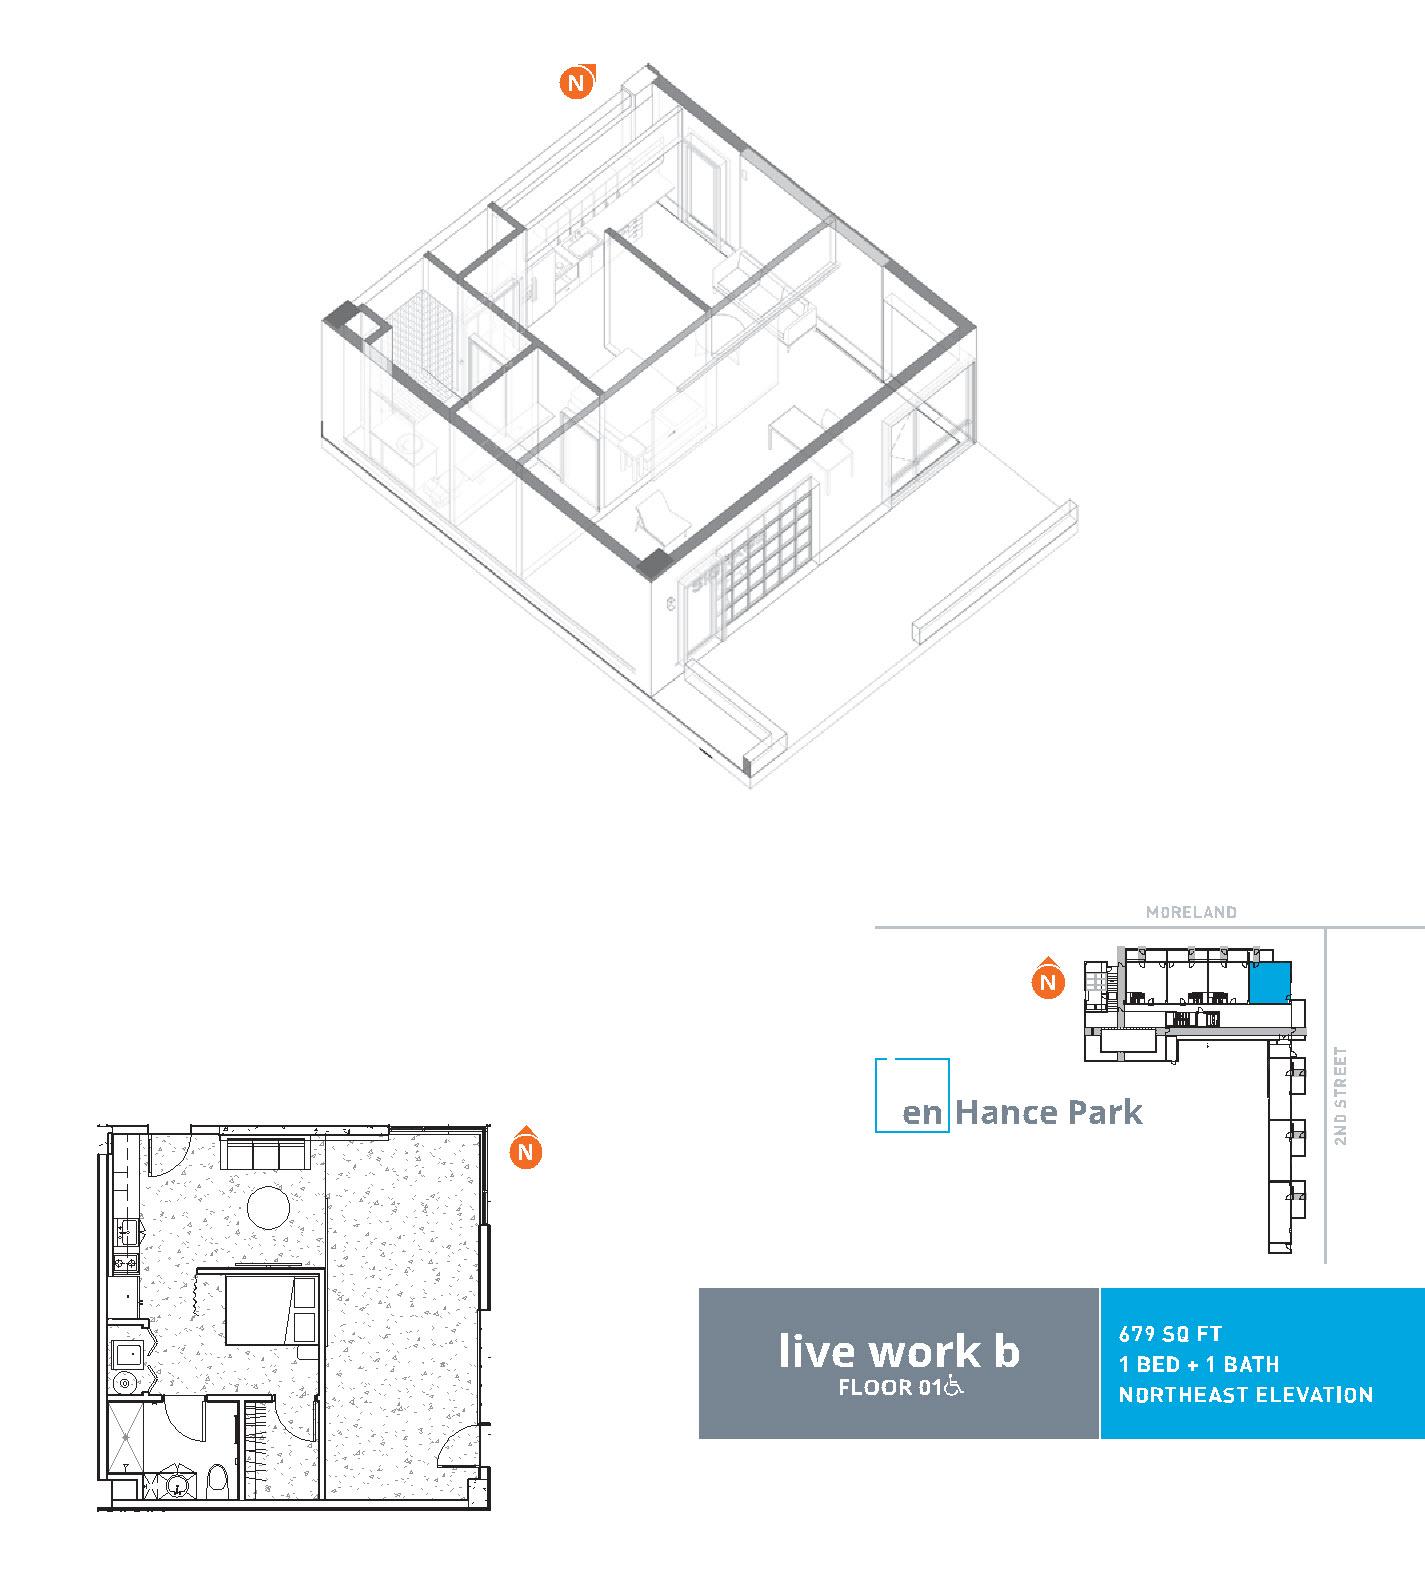 En hance park condo floor plan live work b 1bd